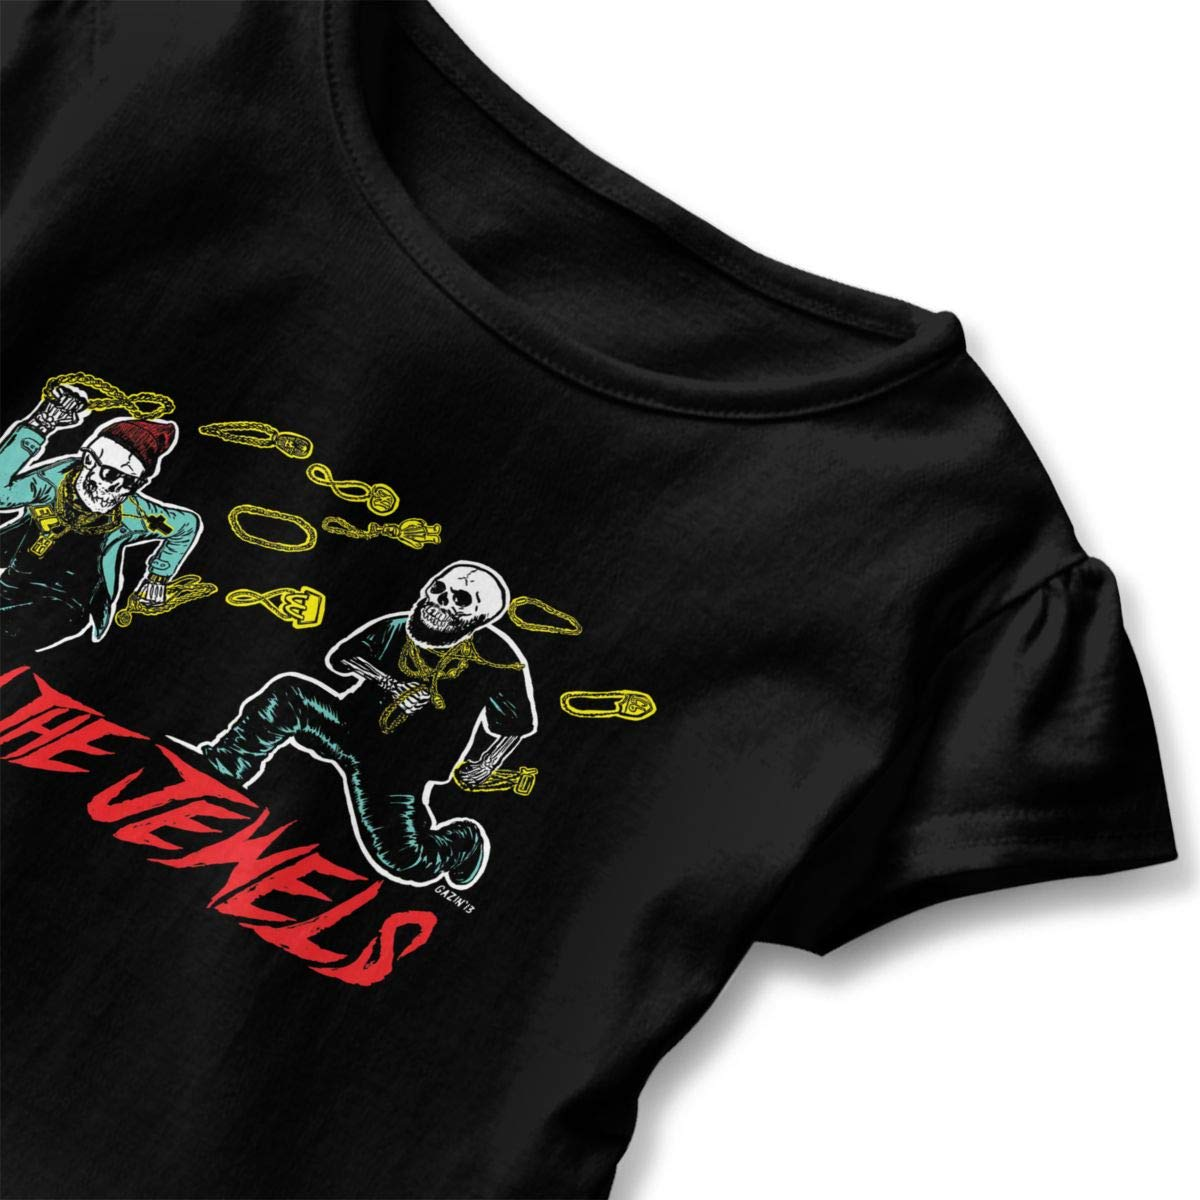 Run The Jewels Shirt Fashion Toddler//Infant Flounced T Shirts Shirt Dress for 2-6T Kids Girls